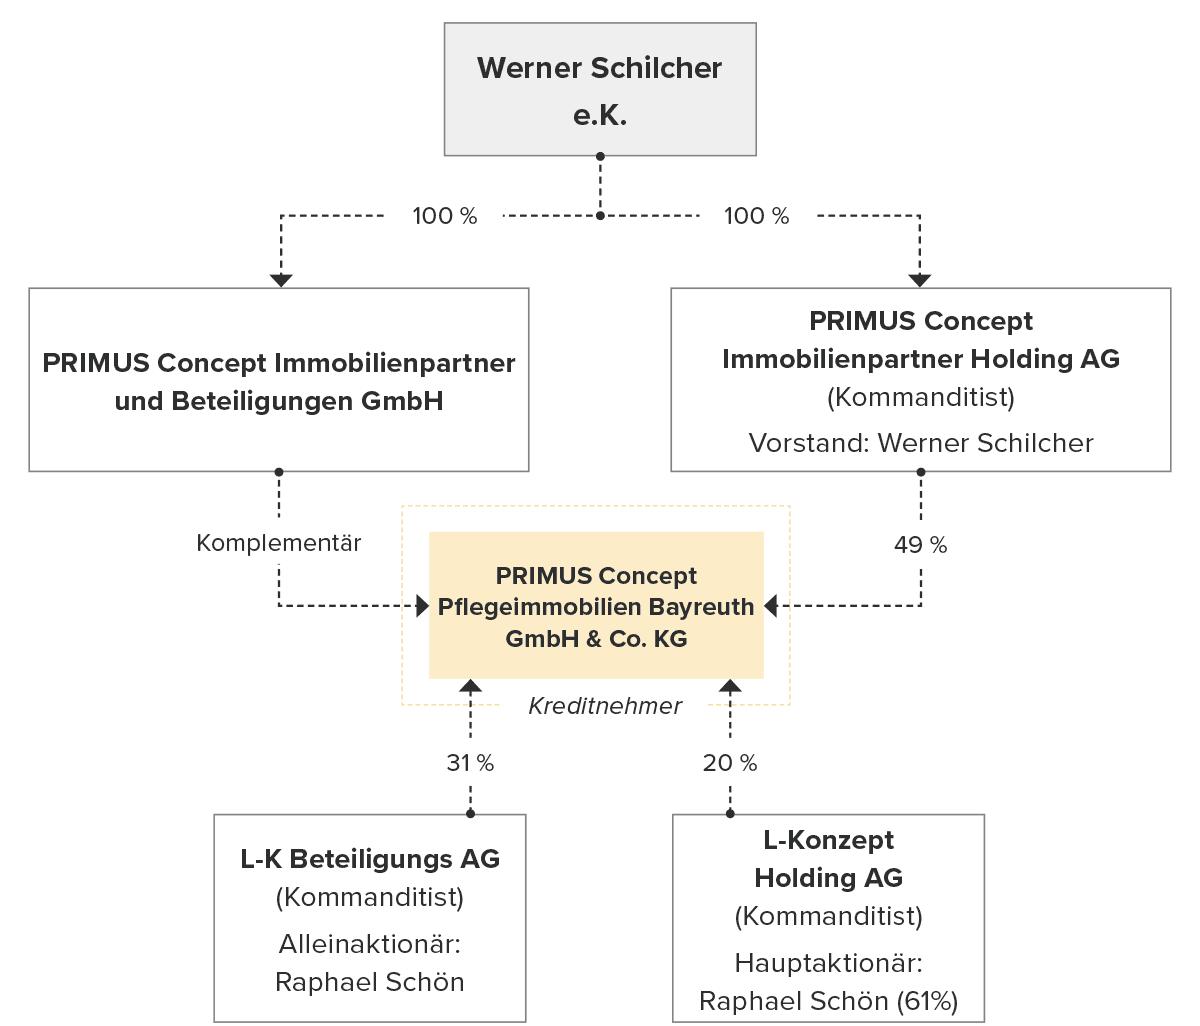 Unternehmensstruktur Primus Concept